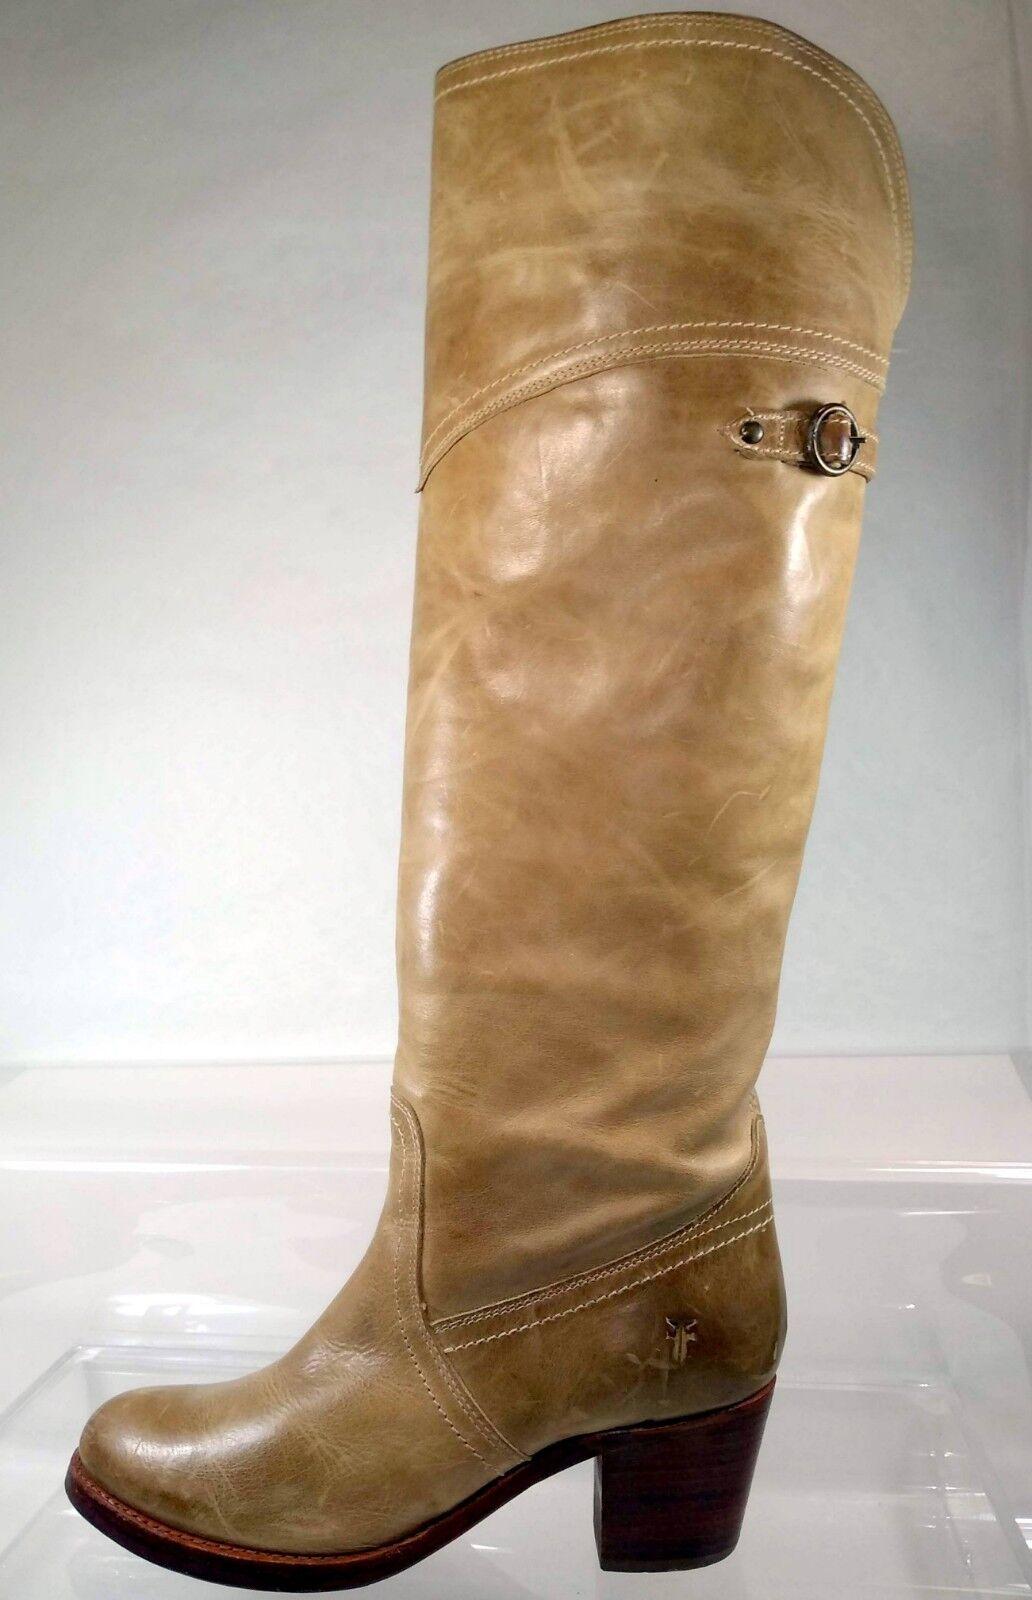 Frye Jane Tall Tall Tall Cuff Au-dessus du genou bottes cavalières femme 8 US 77594 f1bacf